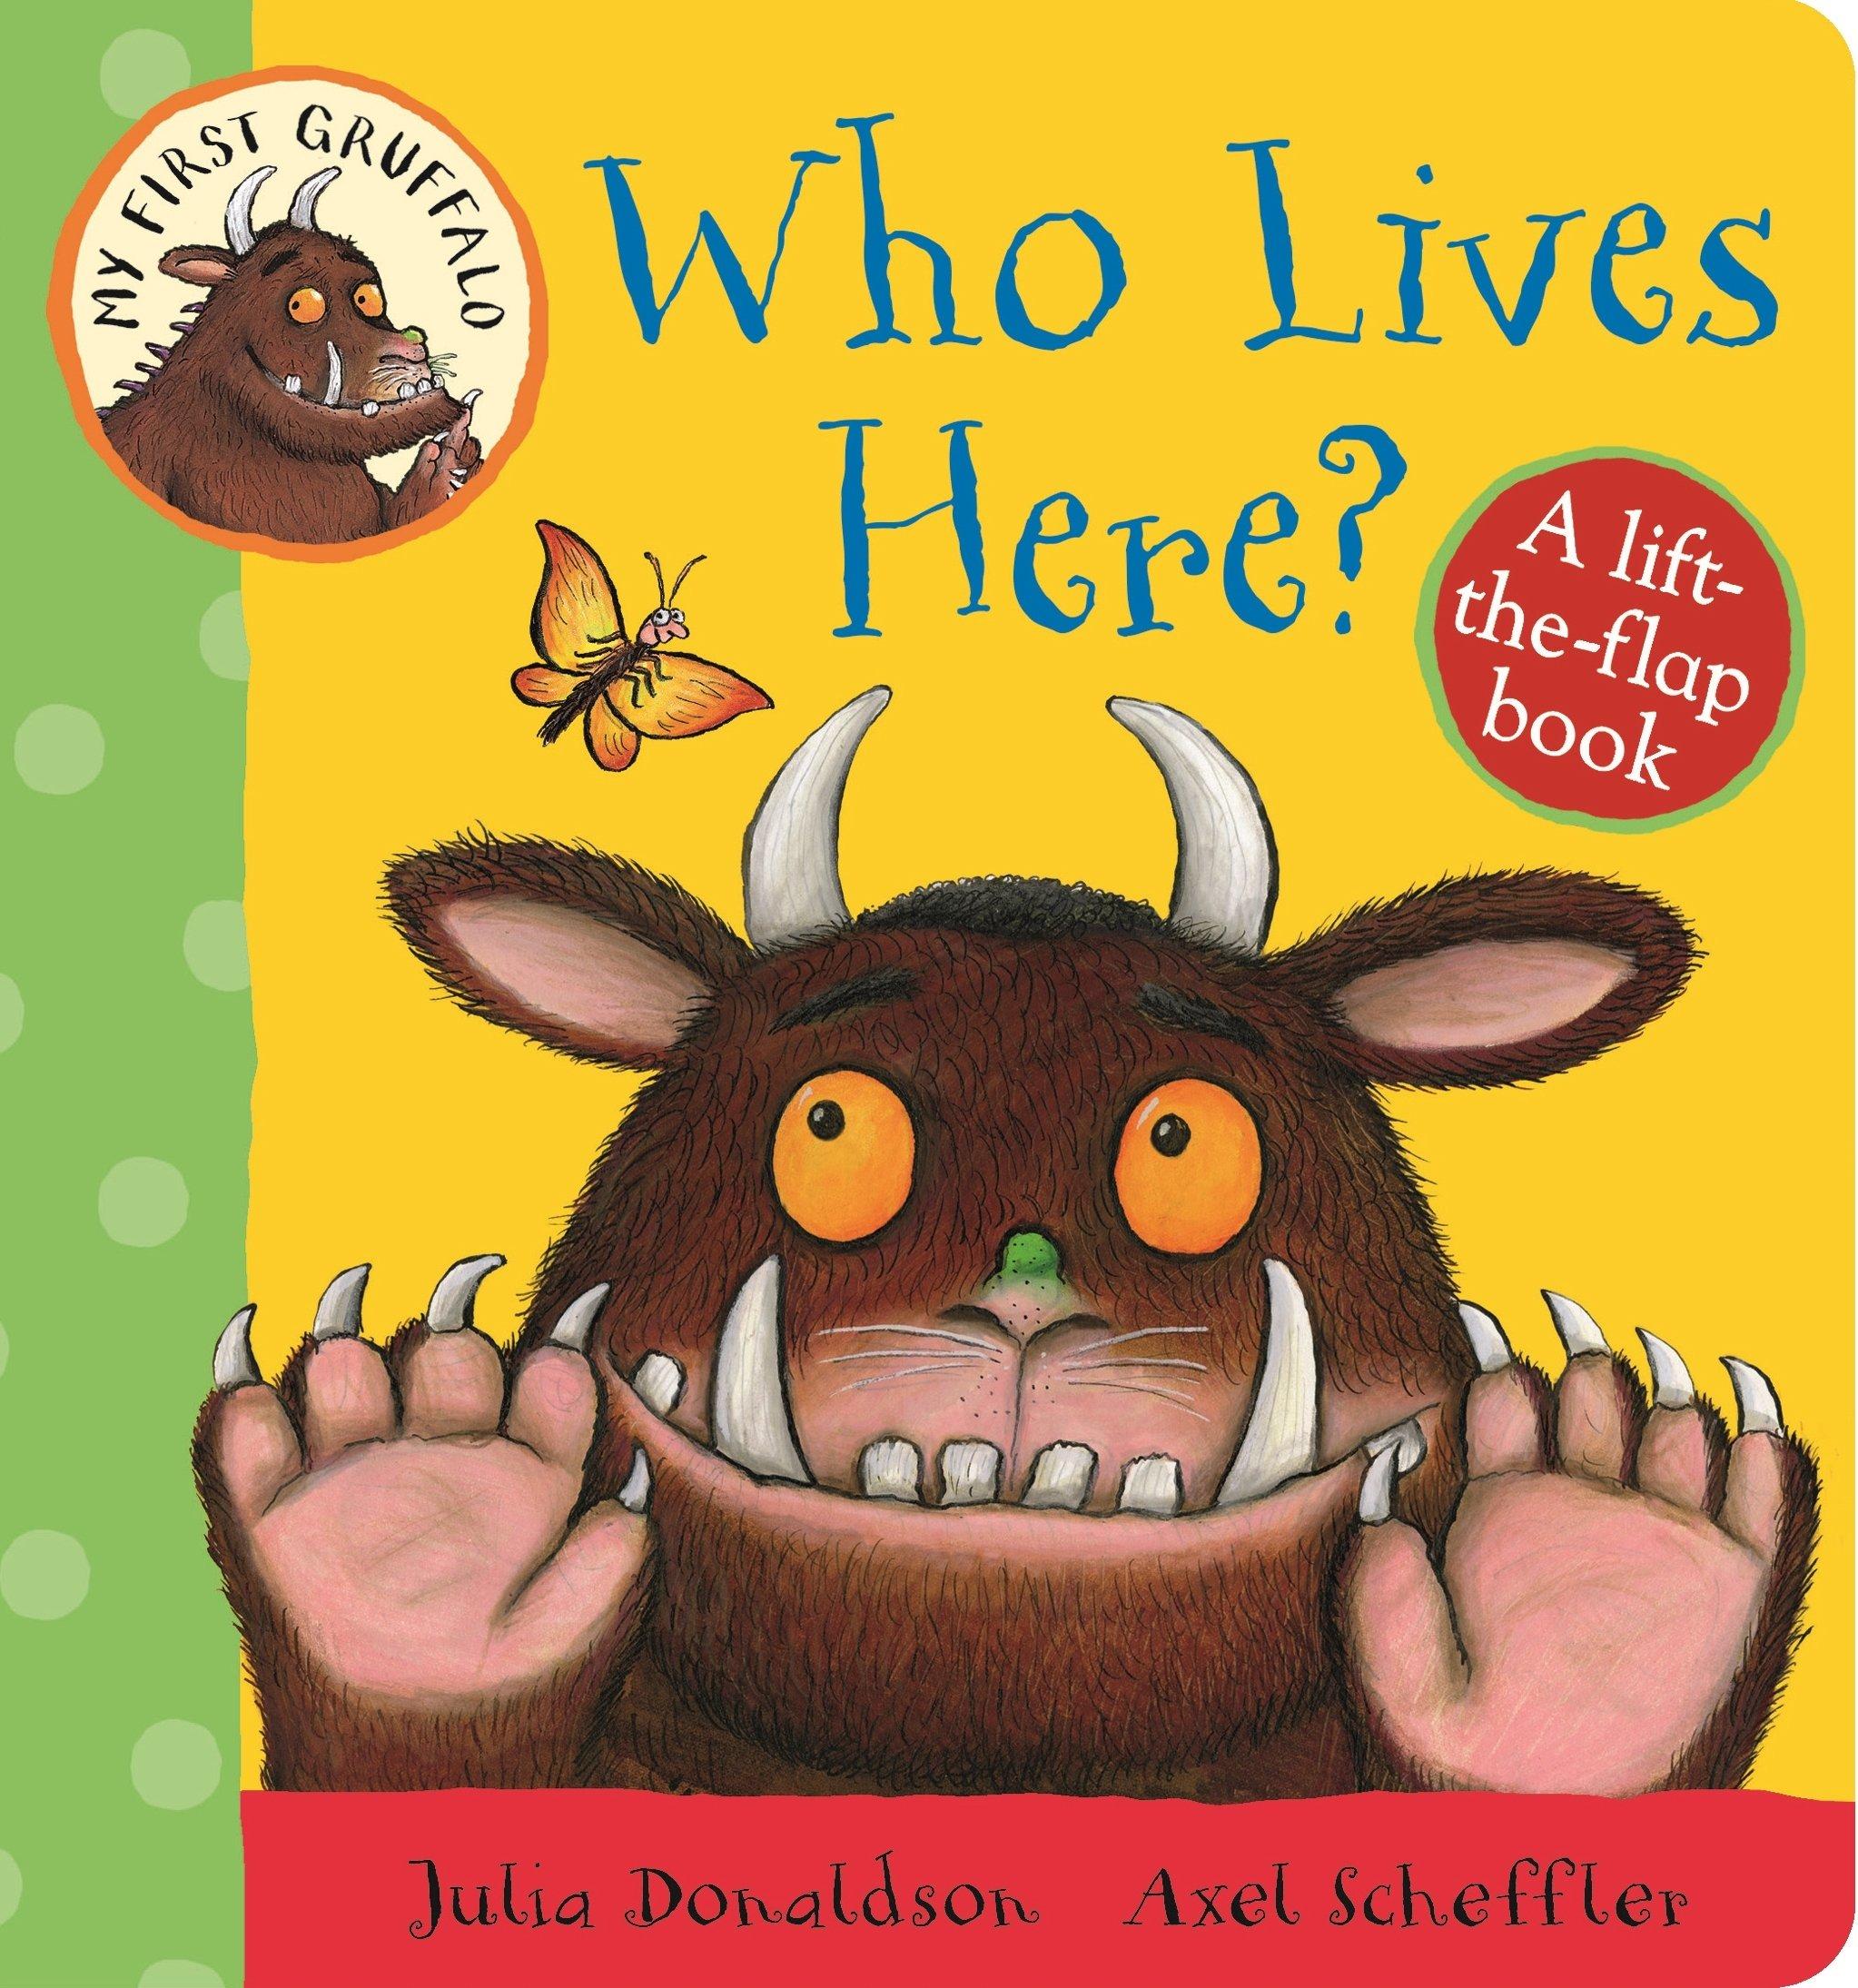 My First Gruffalo: Who Lives Here? Lift-the-Flap Book: A Lift-the-Flap Book: Amazon.es: Donaldson, Julia: Libros en idiomas extranjeros